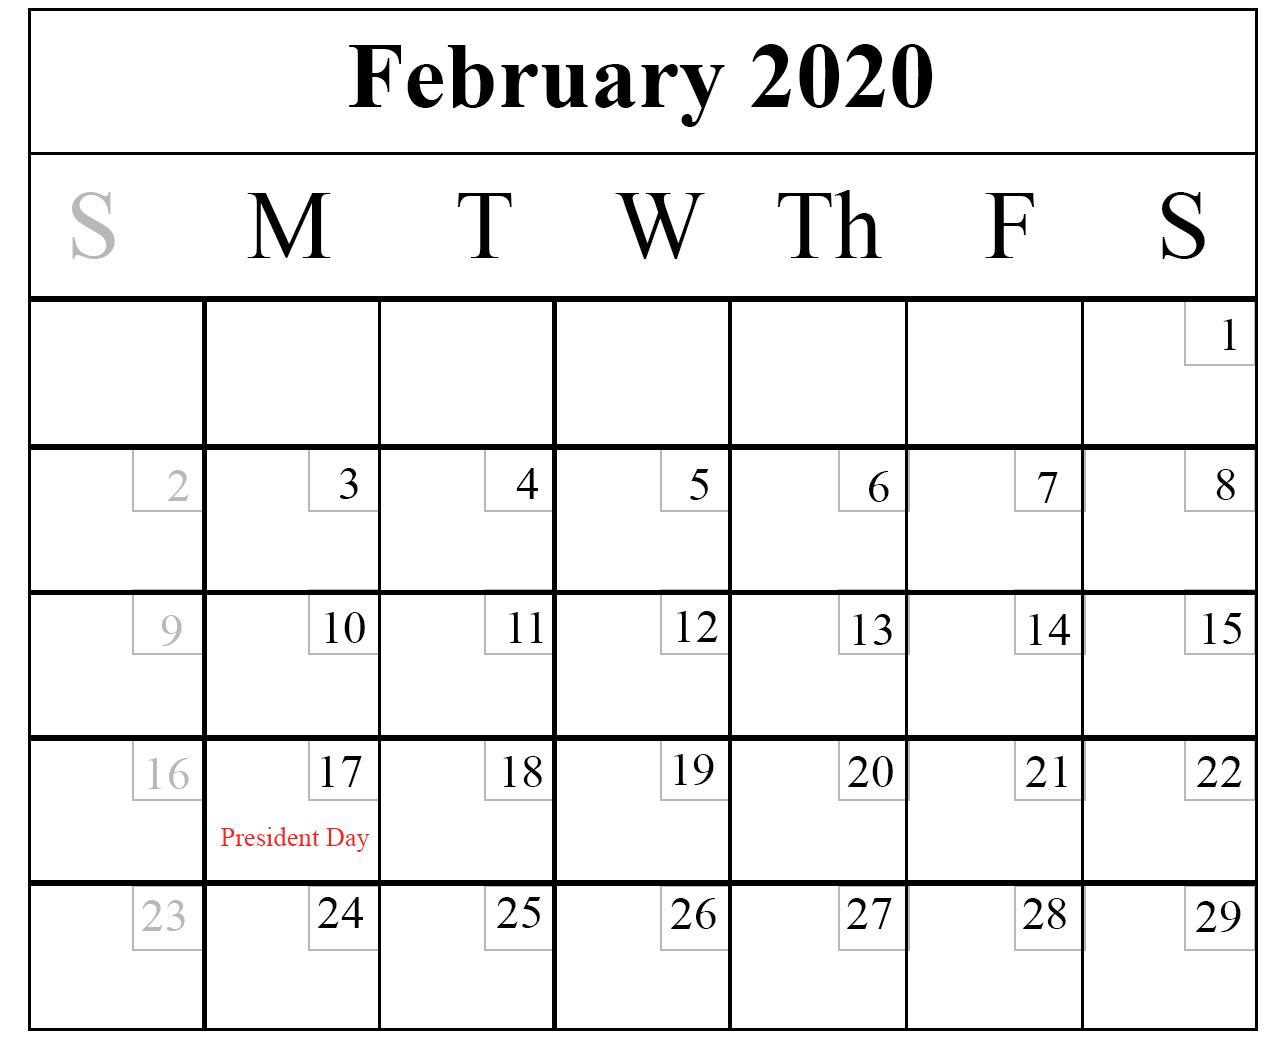 Free February Calendar Template   Printable Calendar inside Vertex Calendars 2020 Printable